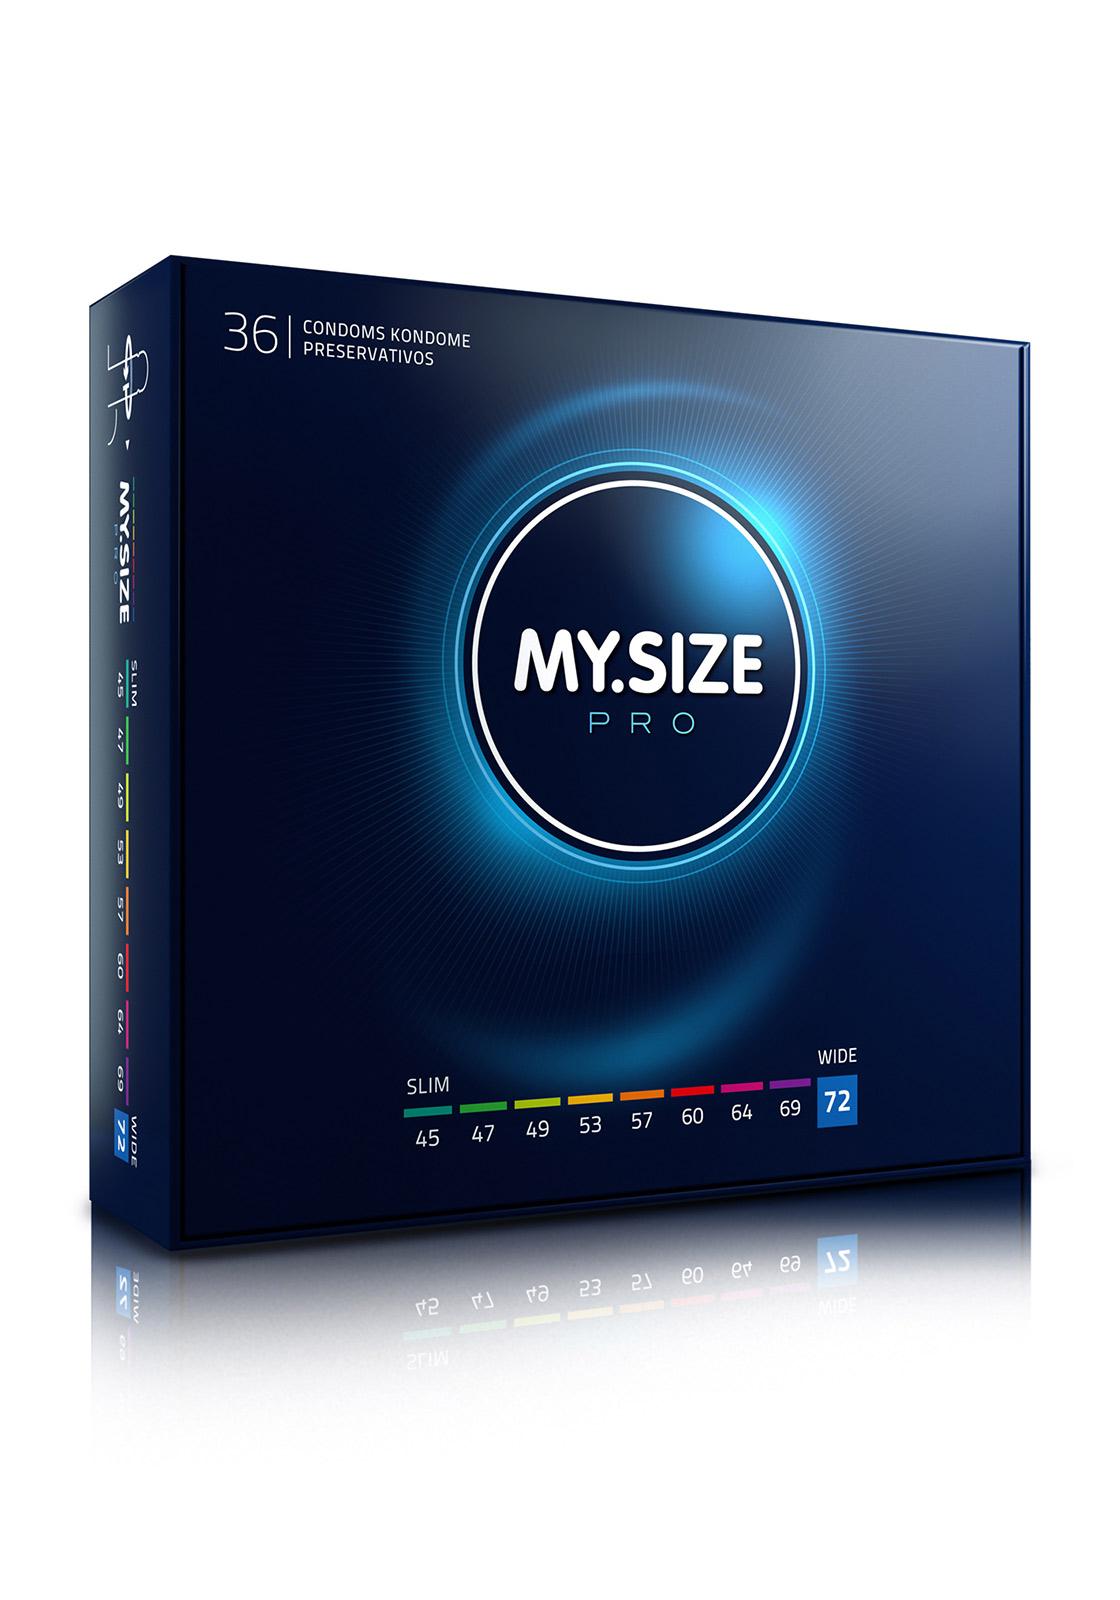 My.Size Pro Kondome 72 (36er)